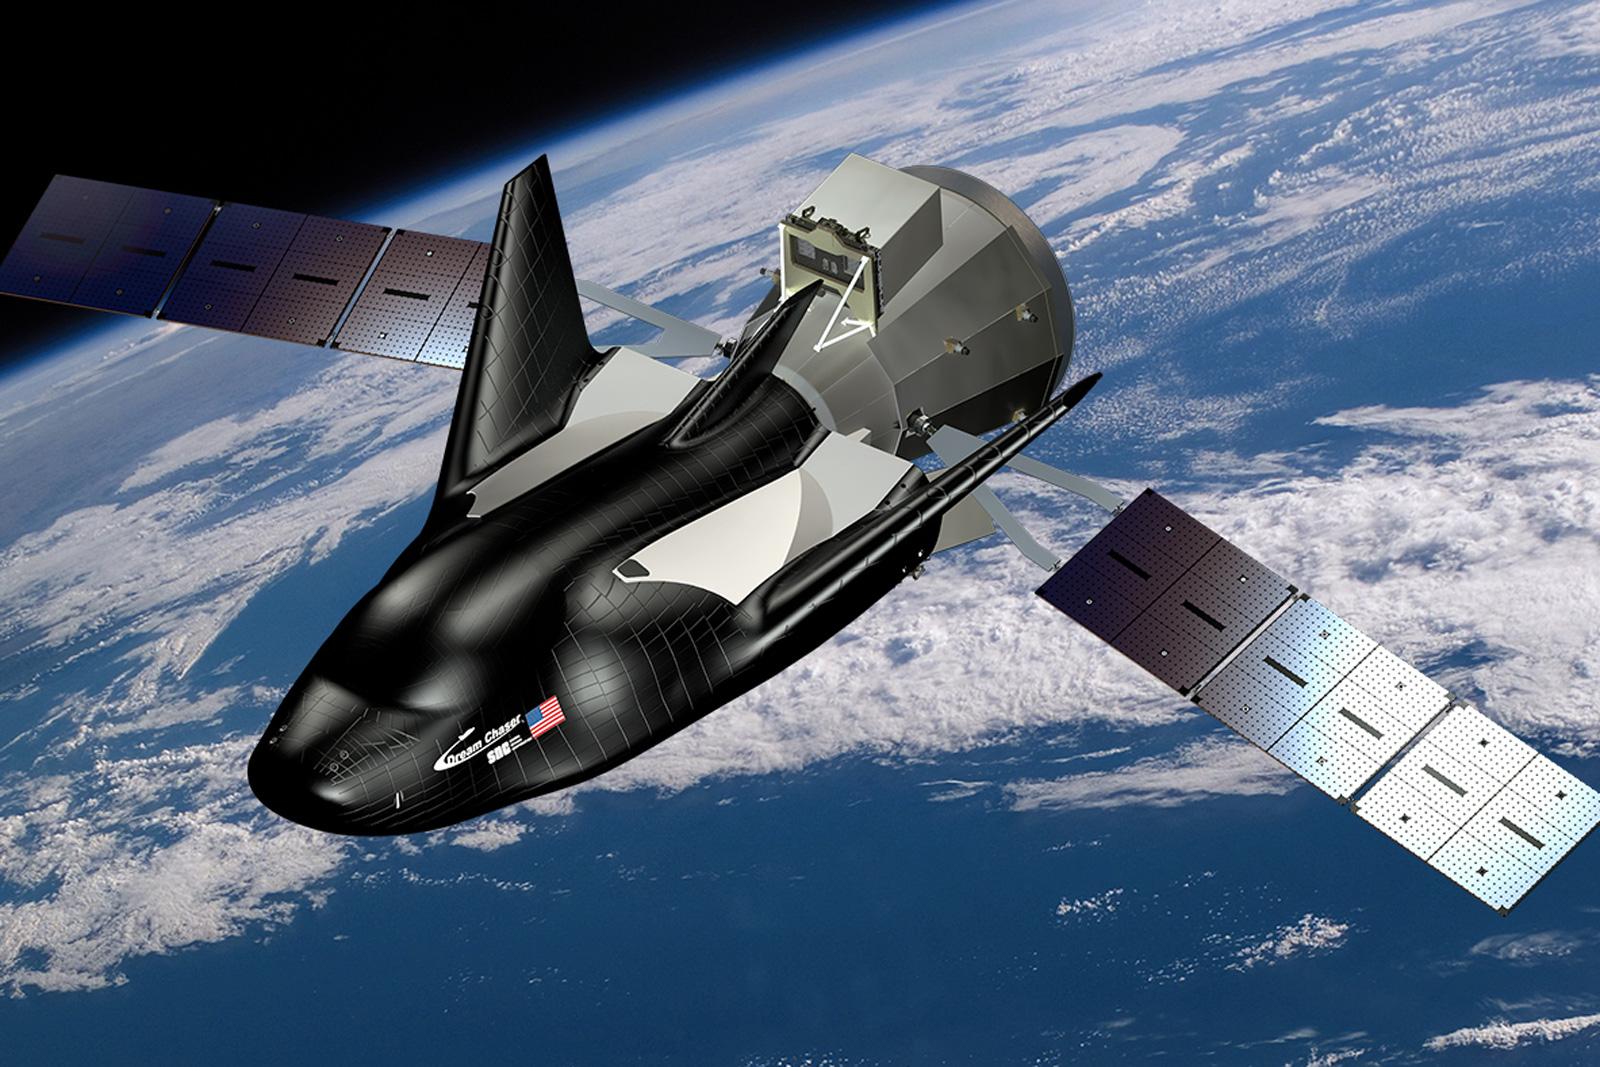 Космический челнок Dream Chaser отправится кМКС в 2020г